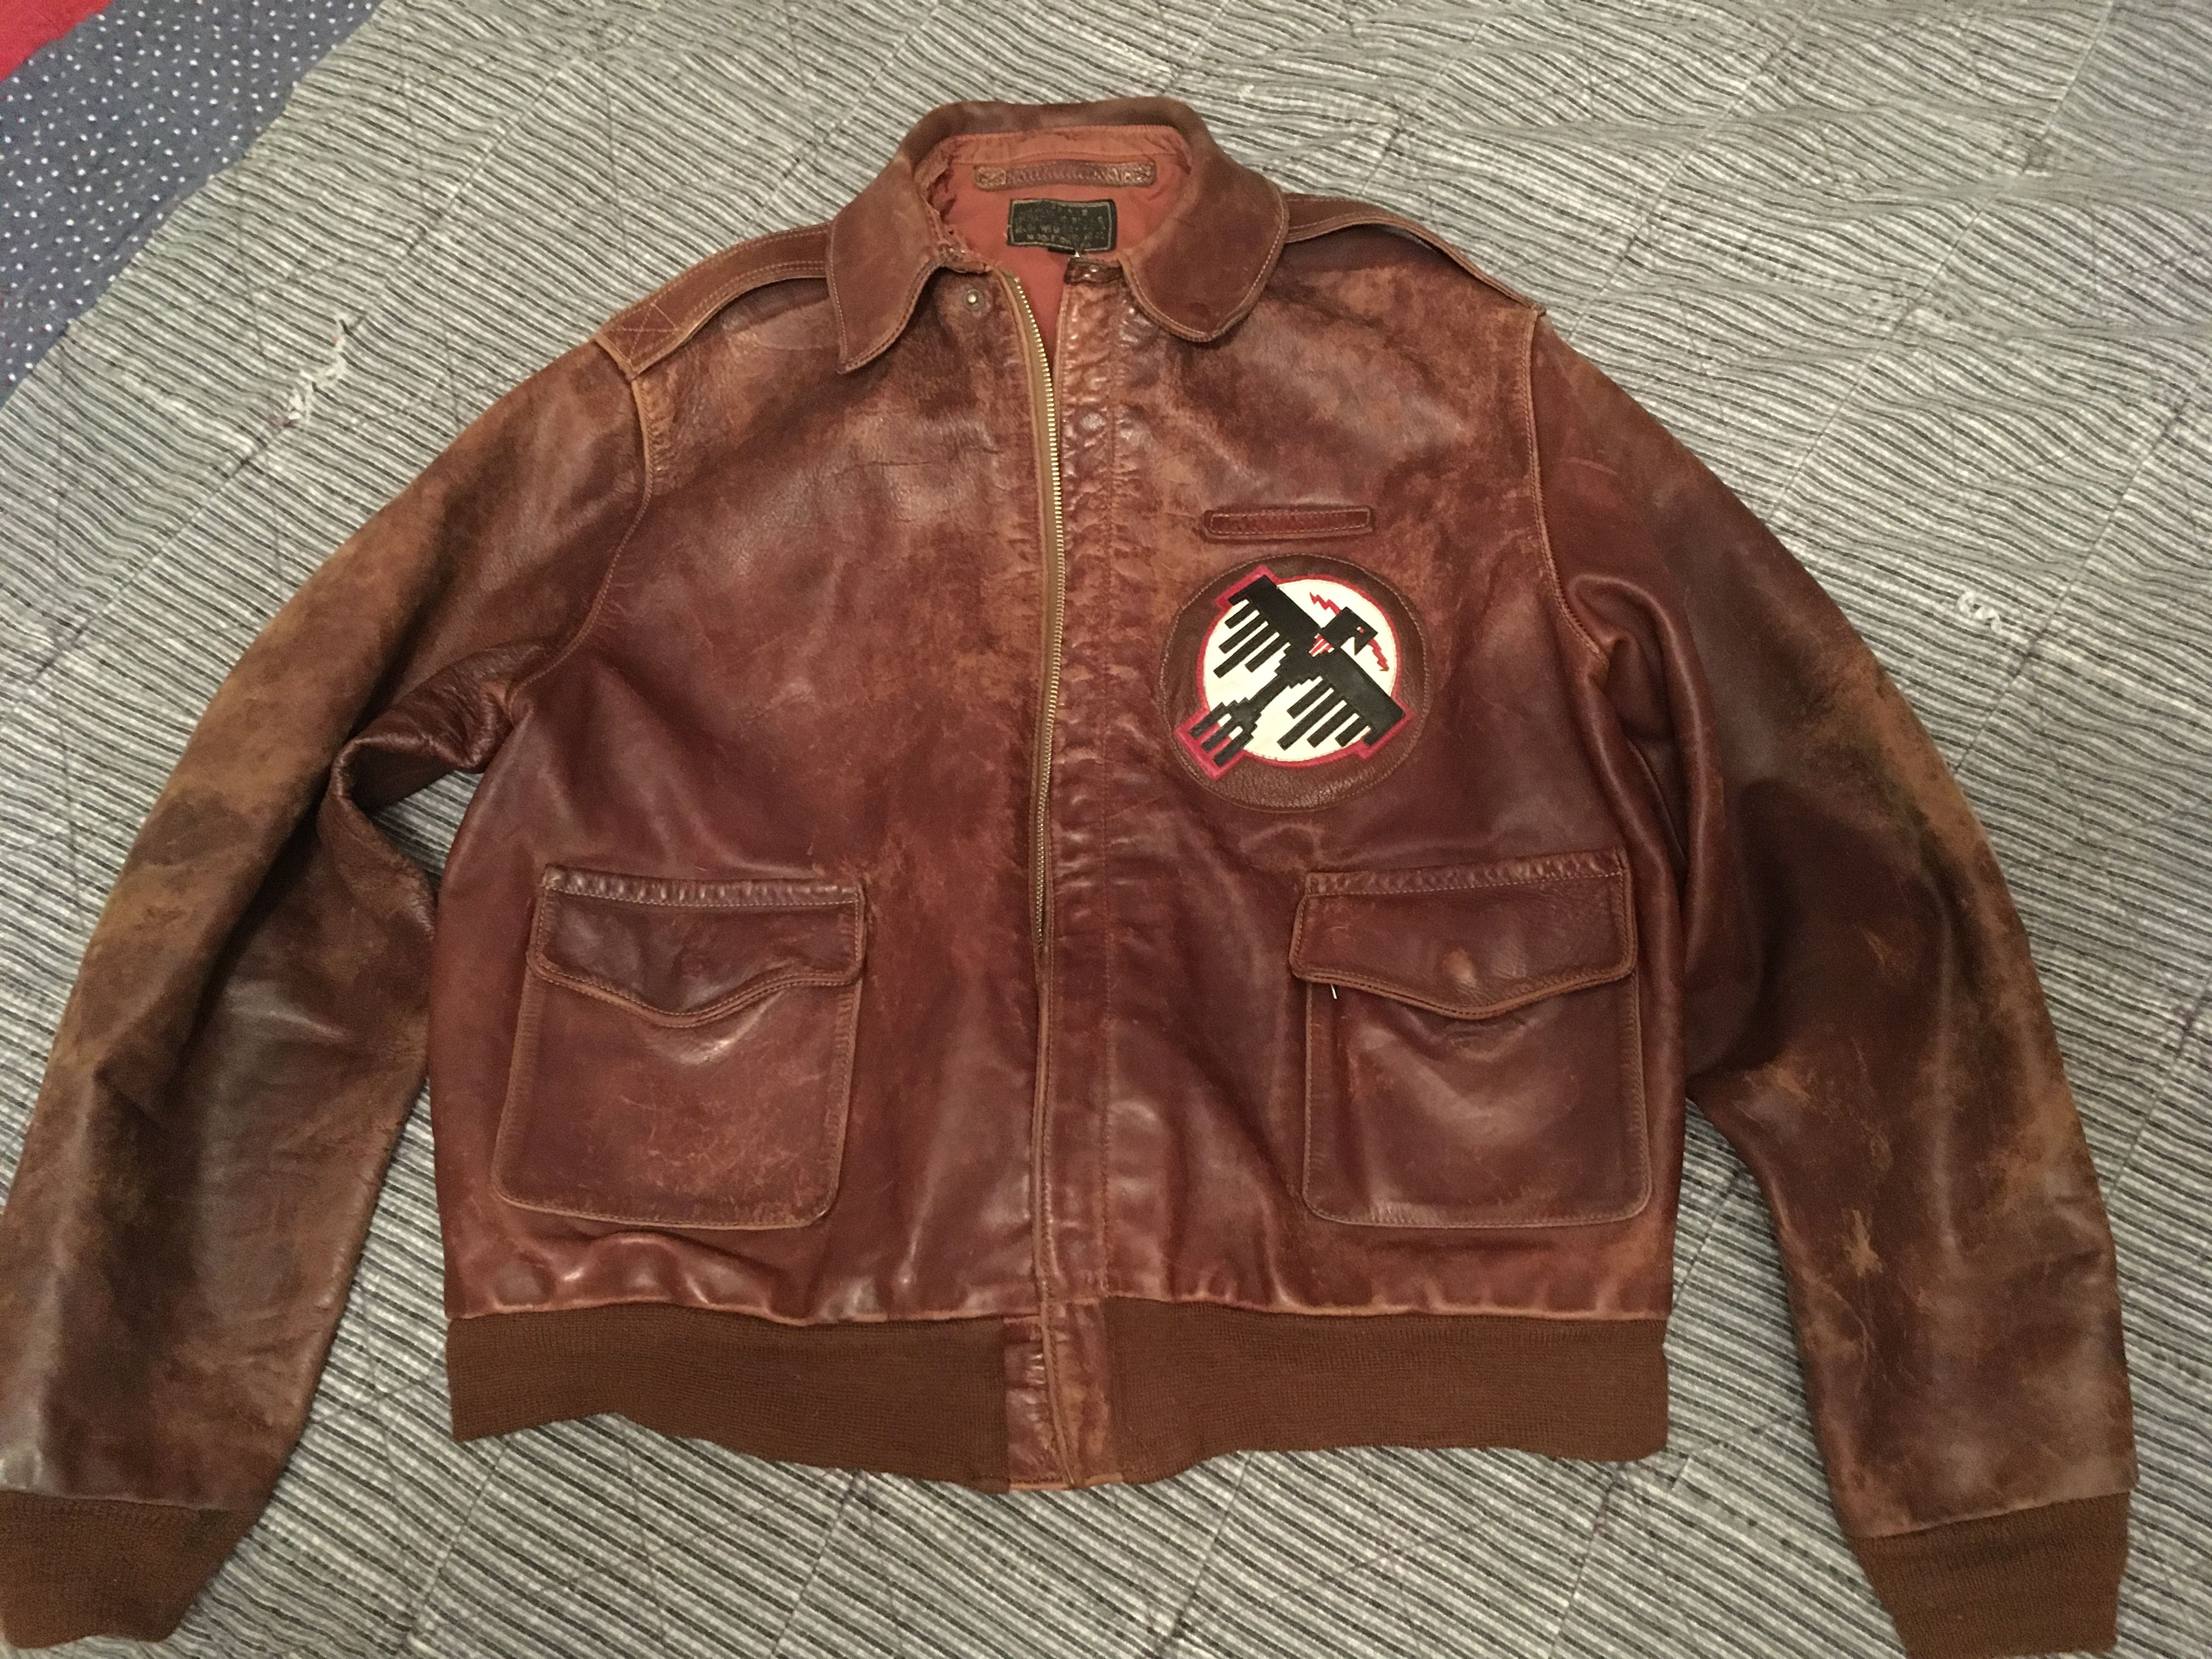 2004 Eastman Rw1401p Leather Flight Jacket Flight Jacket Eastman Leather [ 3024 x 4032 Pixel ]